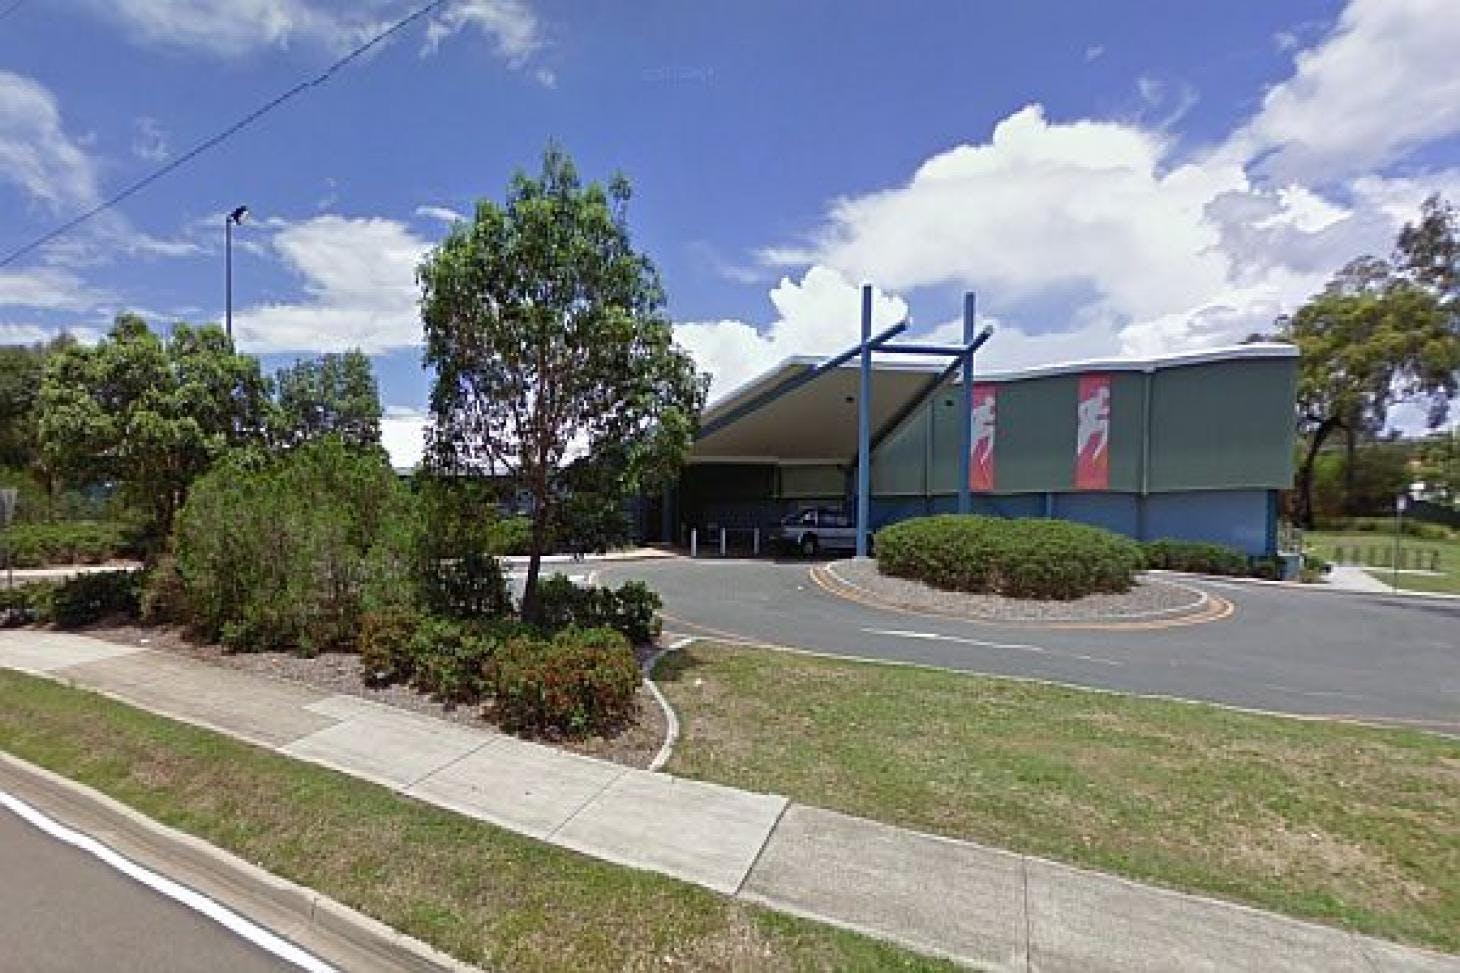 The Warren Sports Centre Full size | Grass cricket facilities